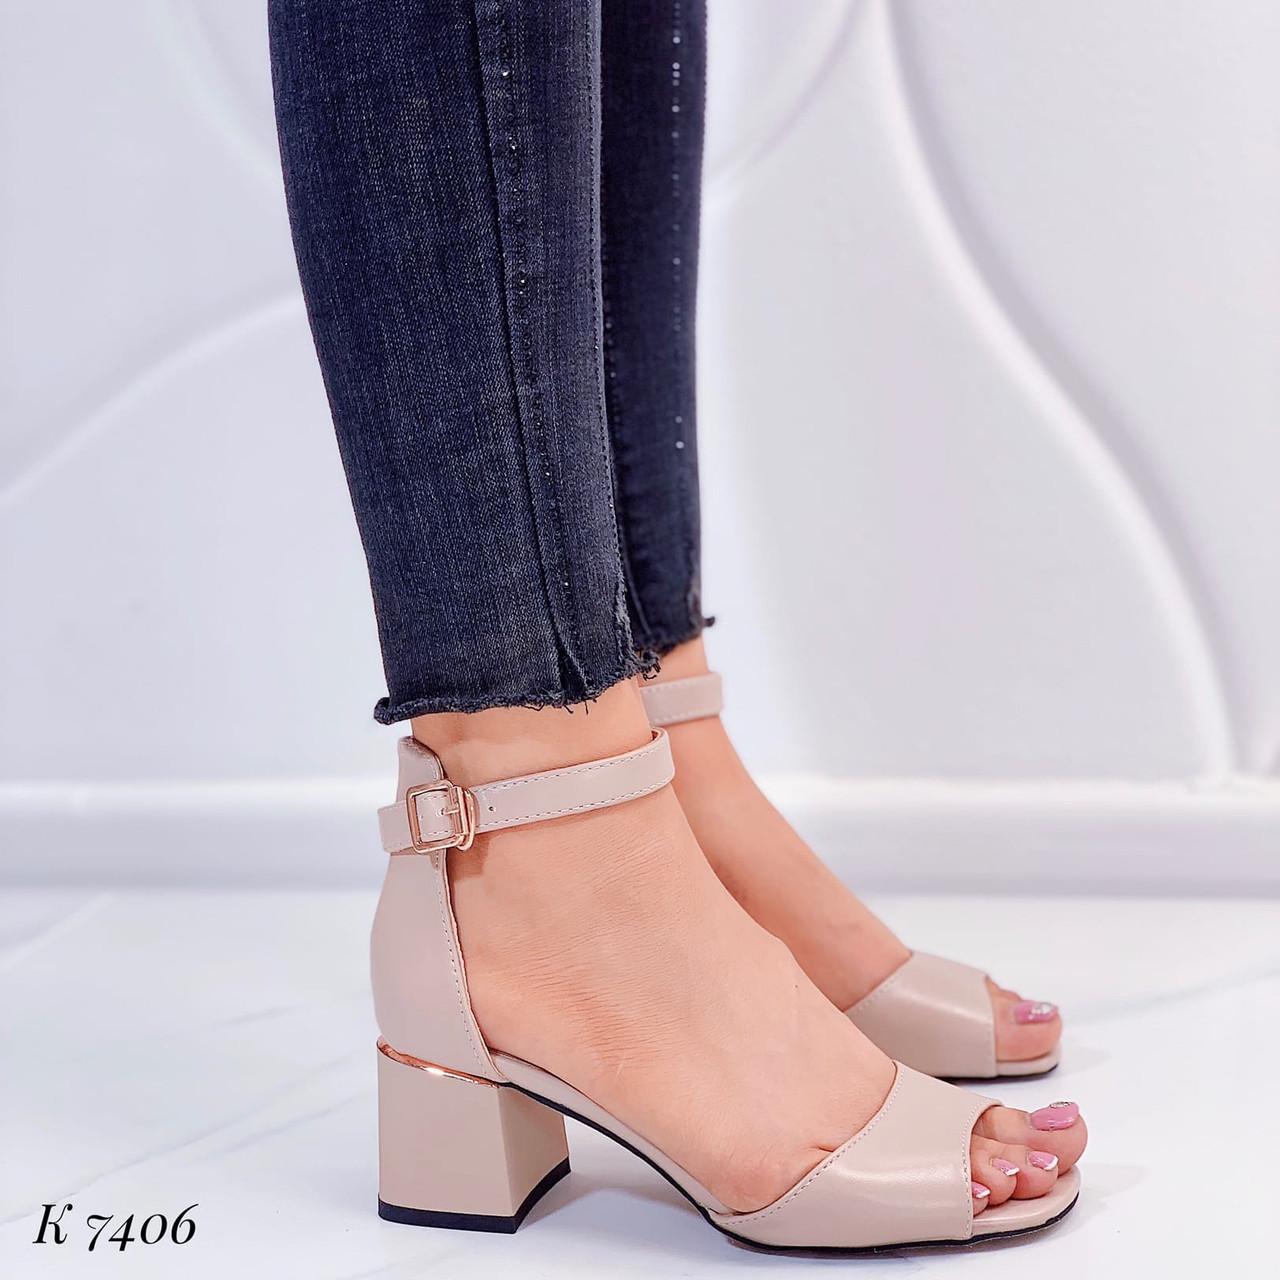 Женские босоножки бежевые - беж на каблуке 5,5 см эко кожа